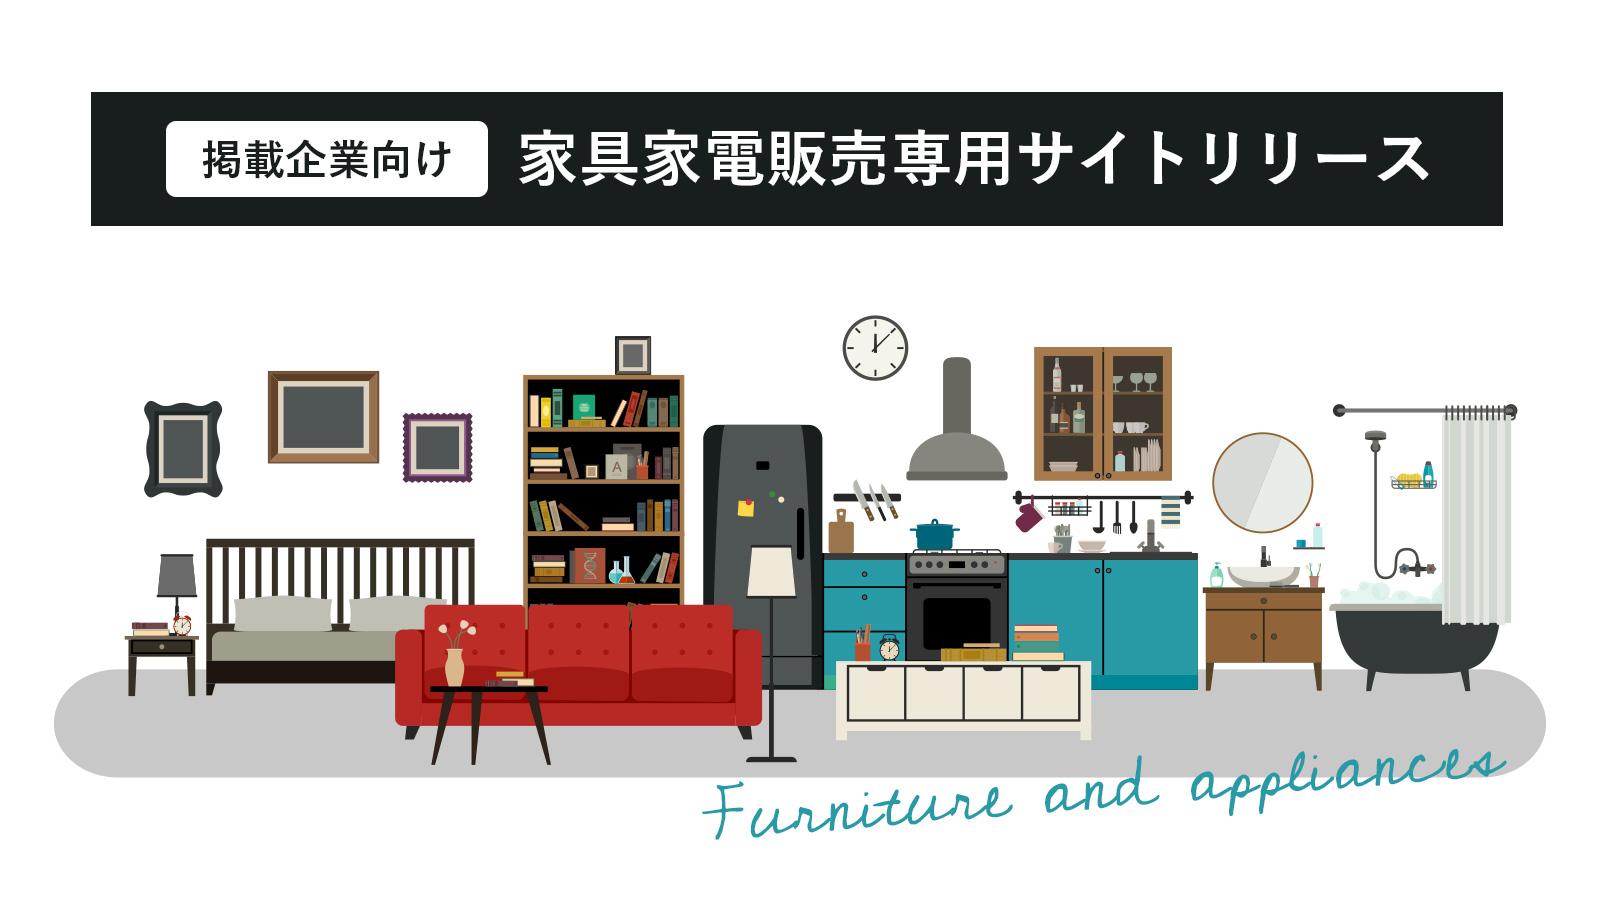 【PR】掲載会社向けに家具家電販売サービスを開始いたしました